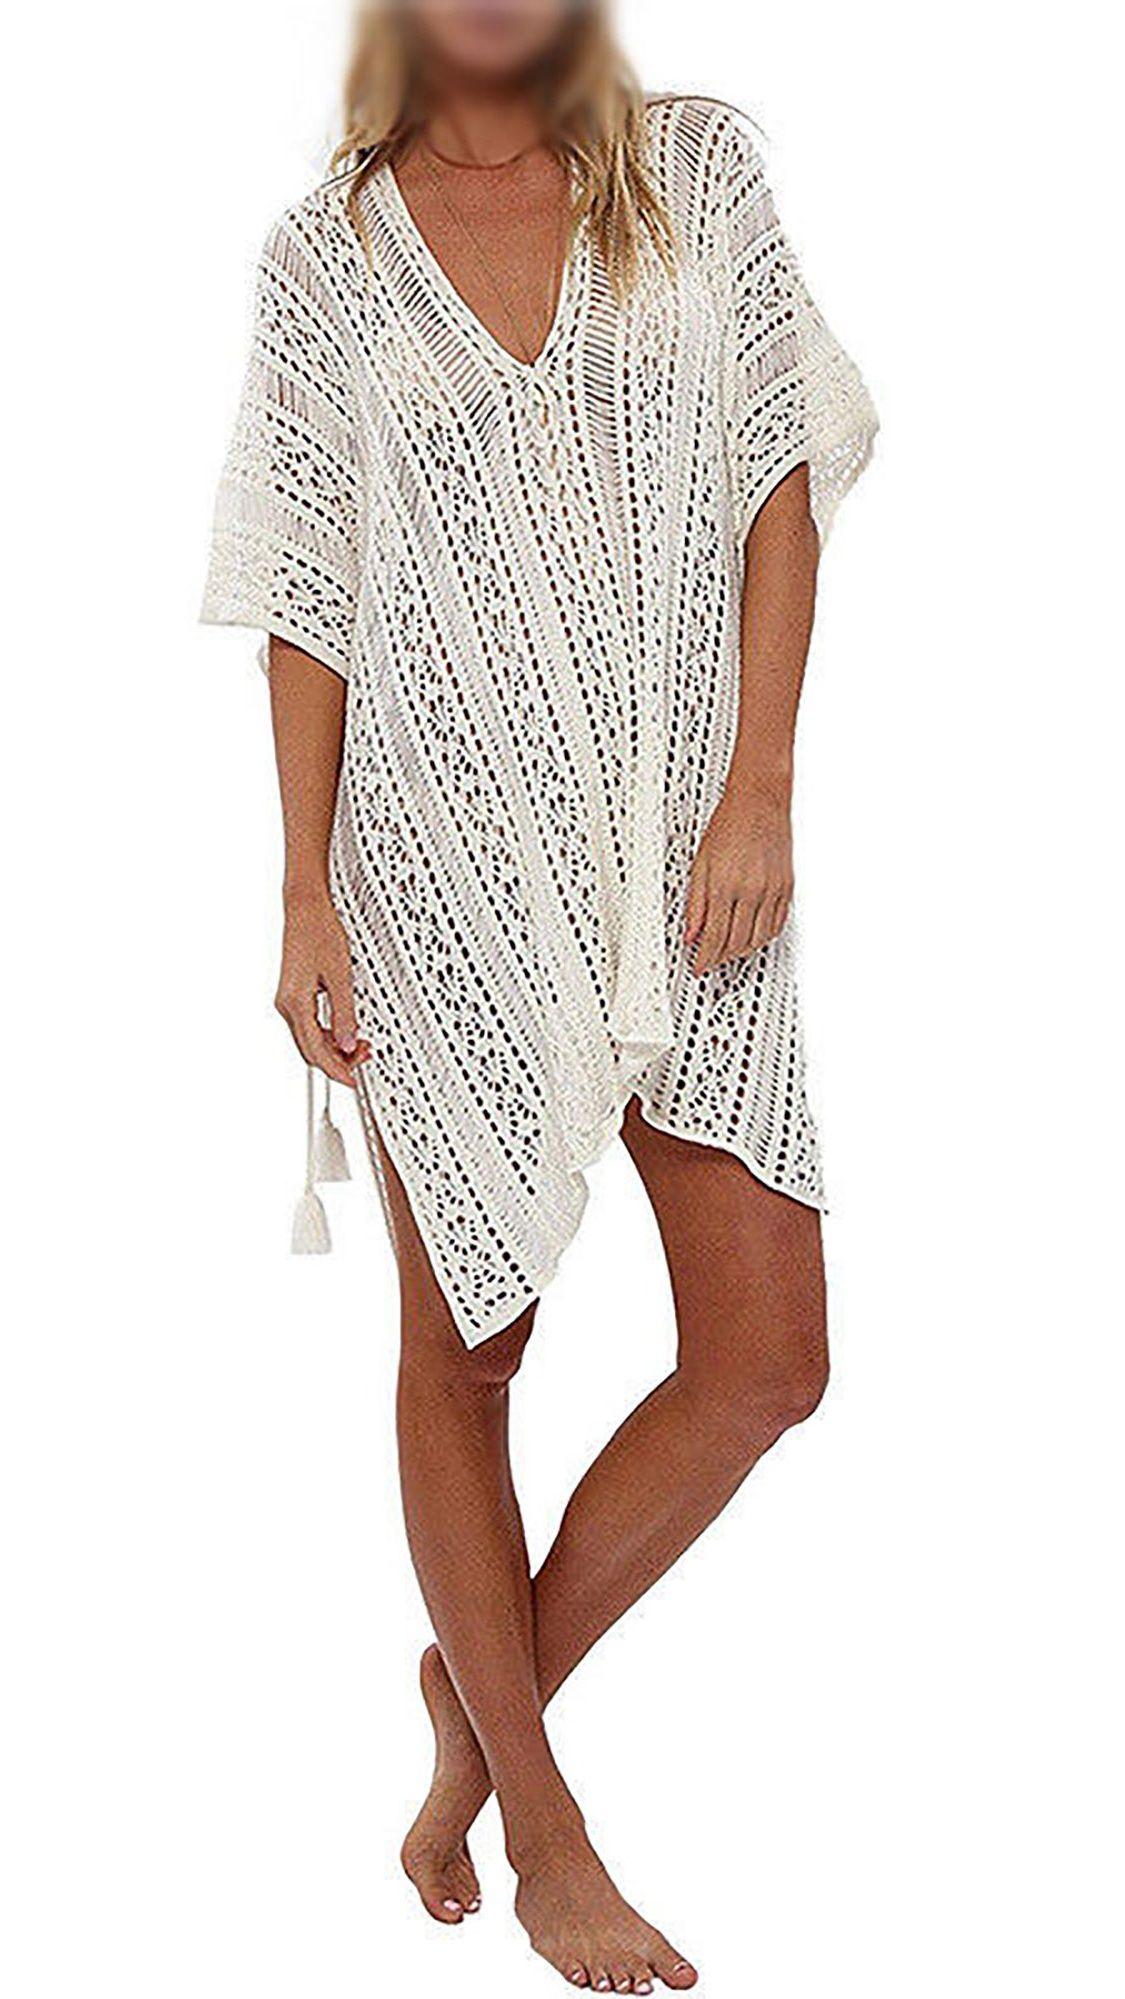 7891e7c753c1 Swim Cover ups Women Knit Lace Crochet Bikini Beachwear V-neck Hollow Out  Loose Beach Dress Tops Summer Bathing Suit Crochet